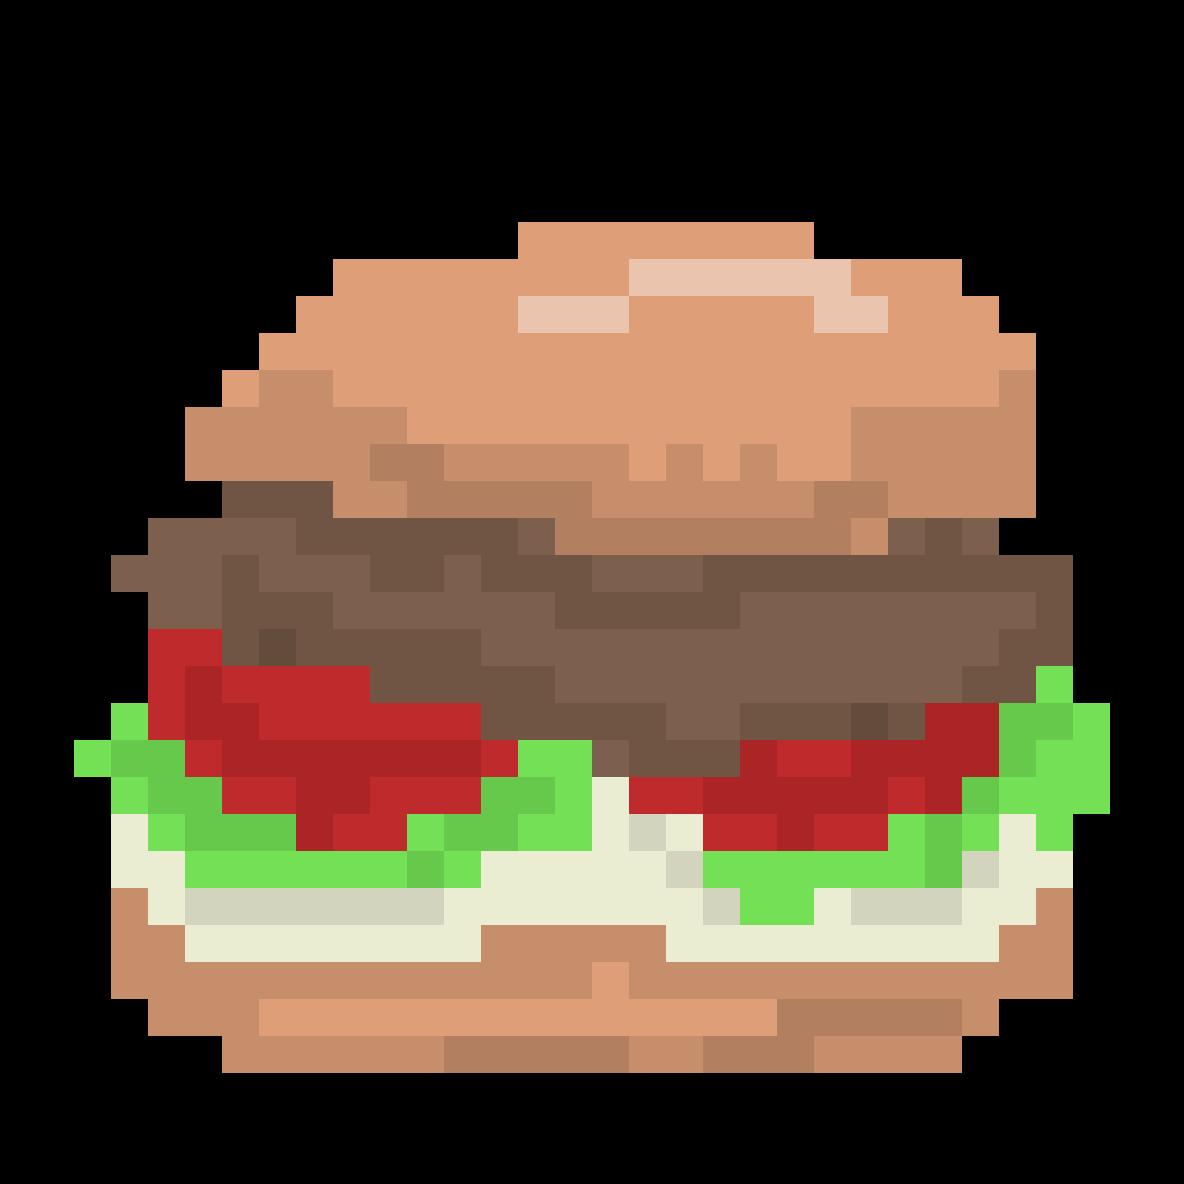 hamburguer by miaperez